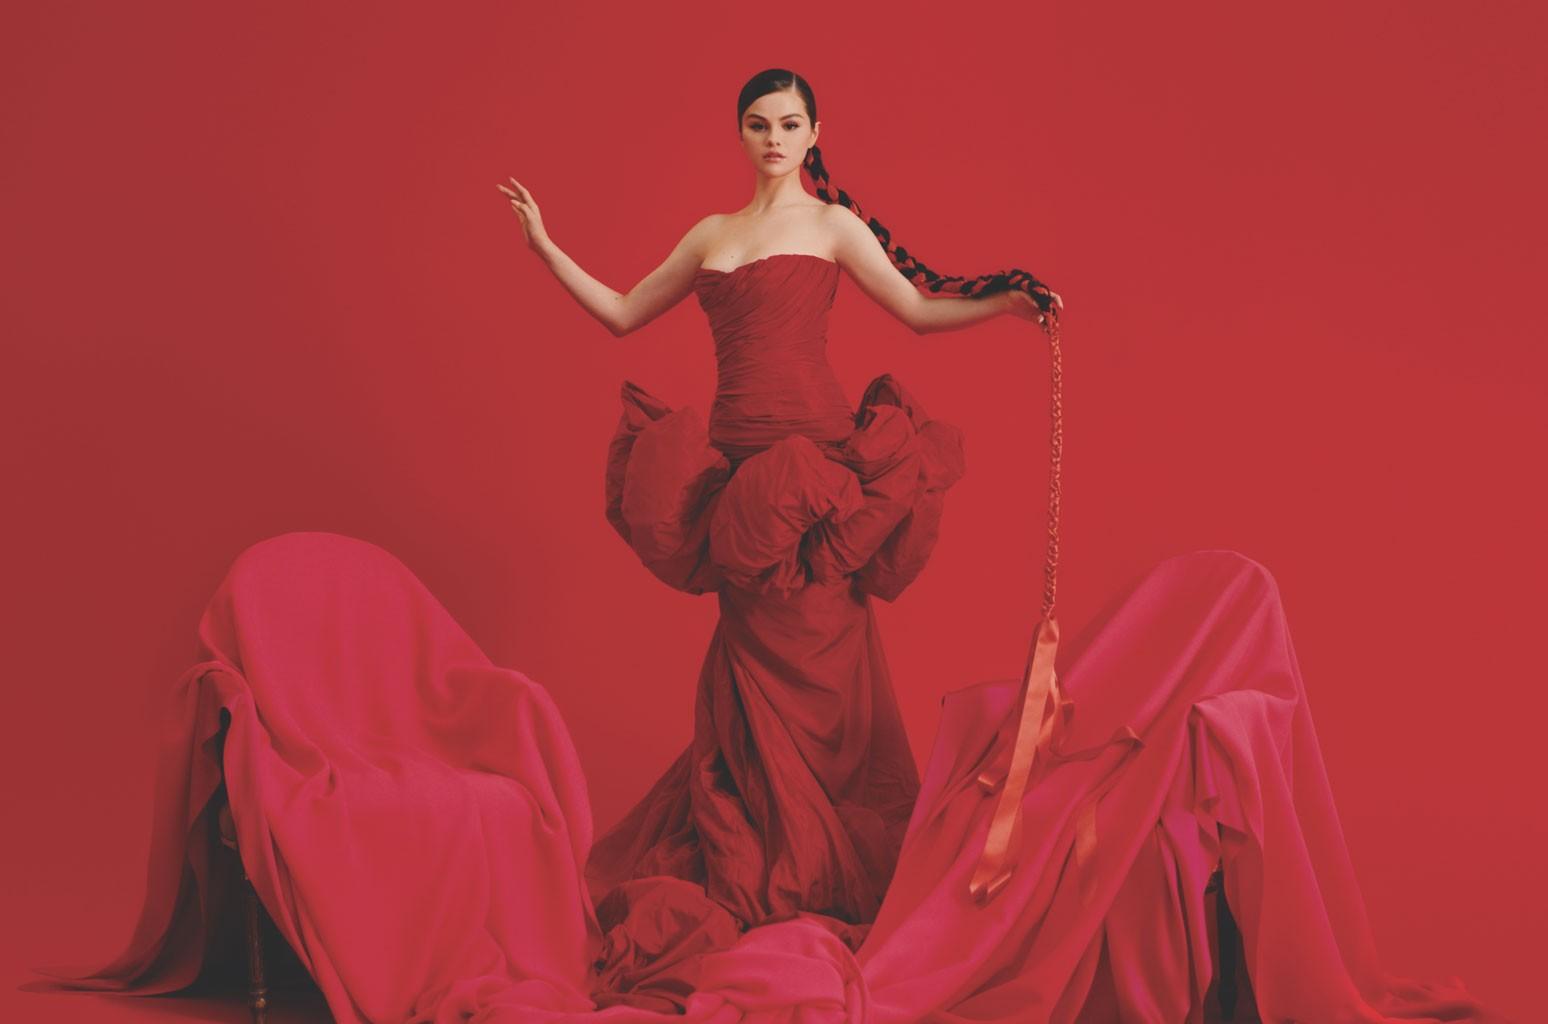 Fans Choose Selena Gomez's 'Revelación' EP as This Week's Favorite New Music